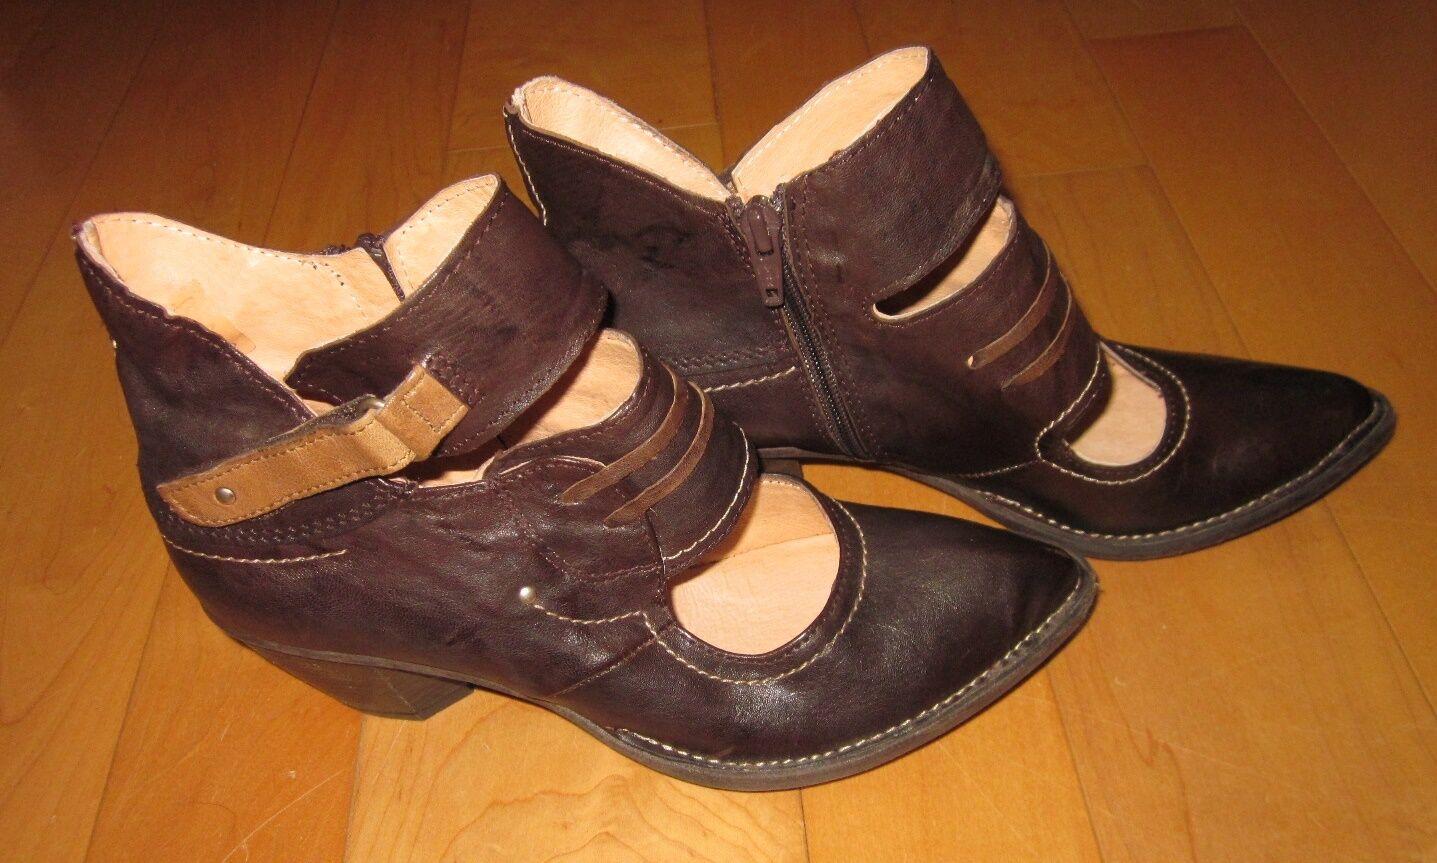 New Khrio donna Marronee Leather Heels Sharp Must C 38 US 7.5